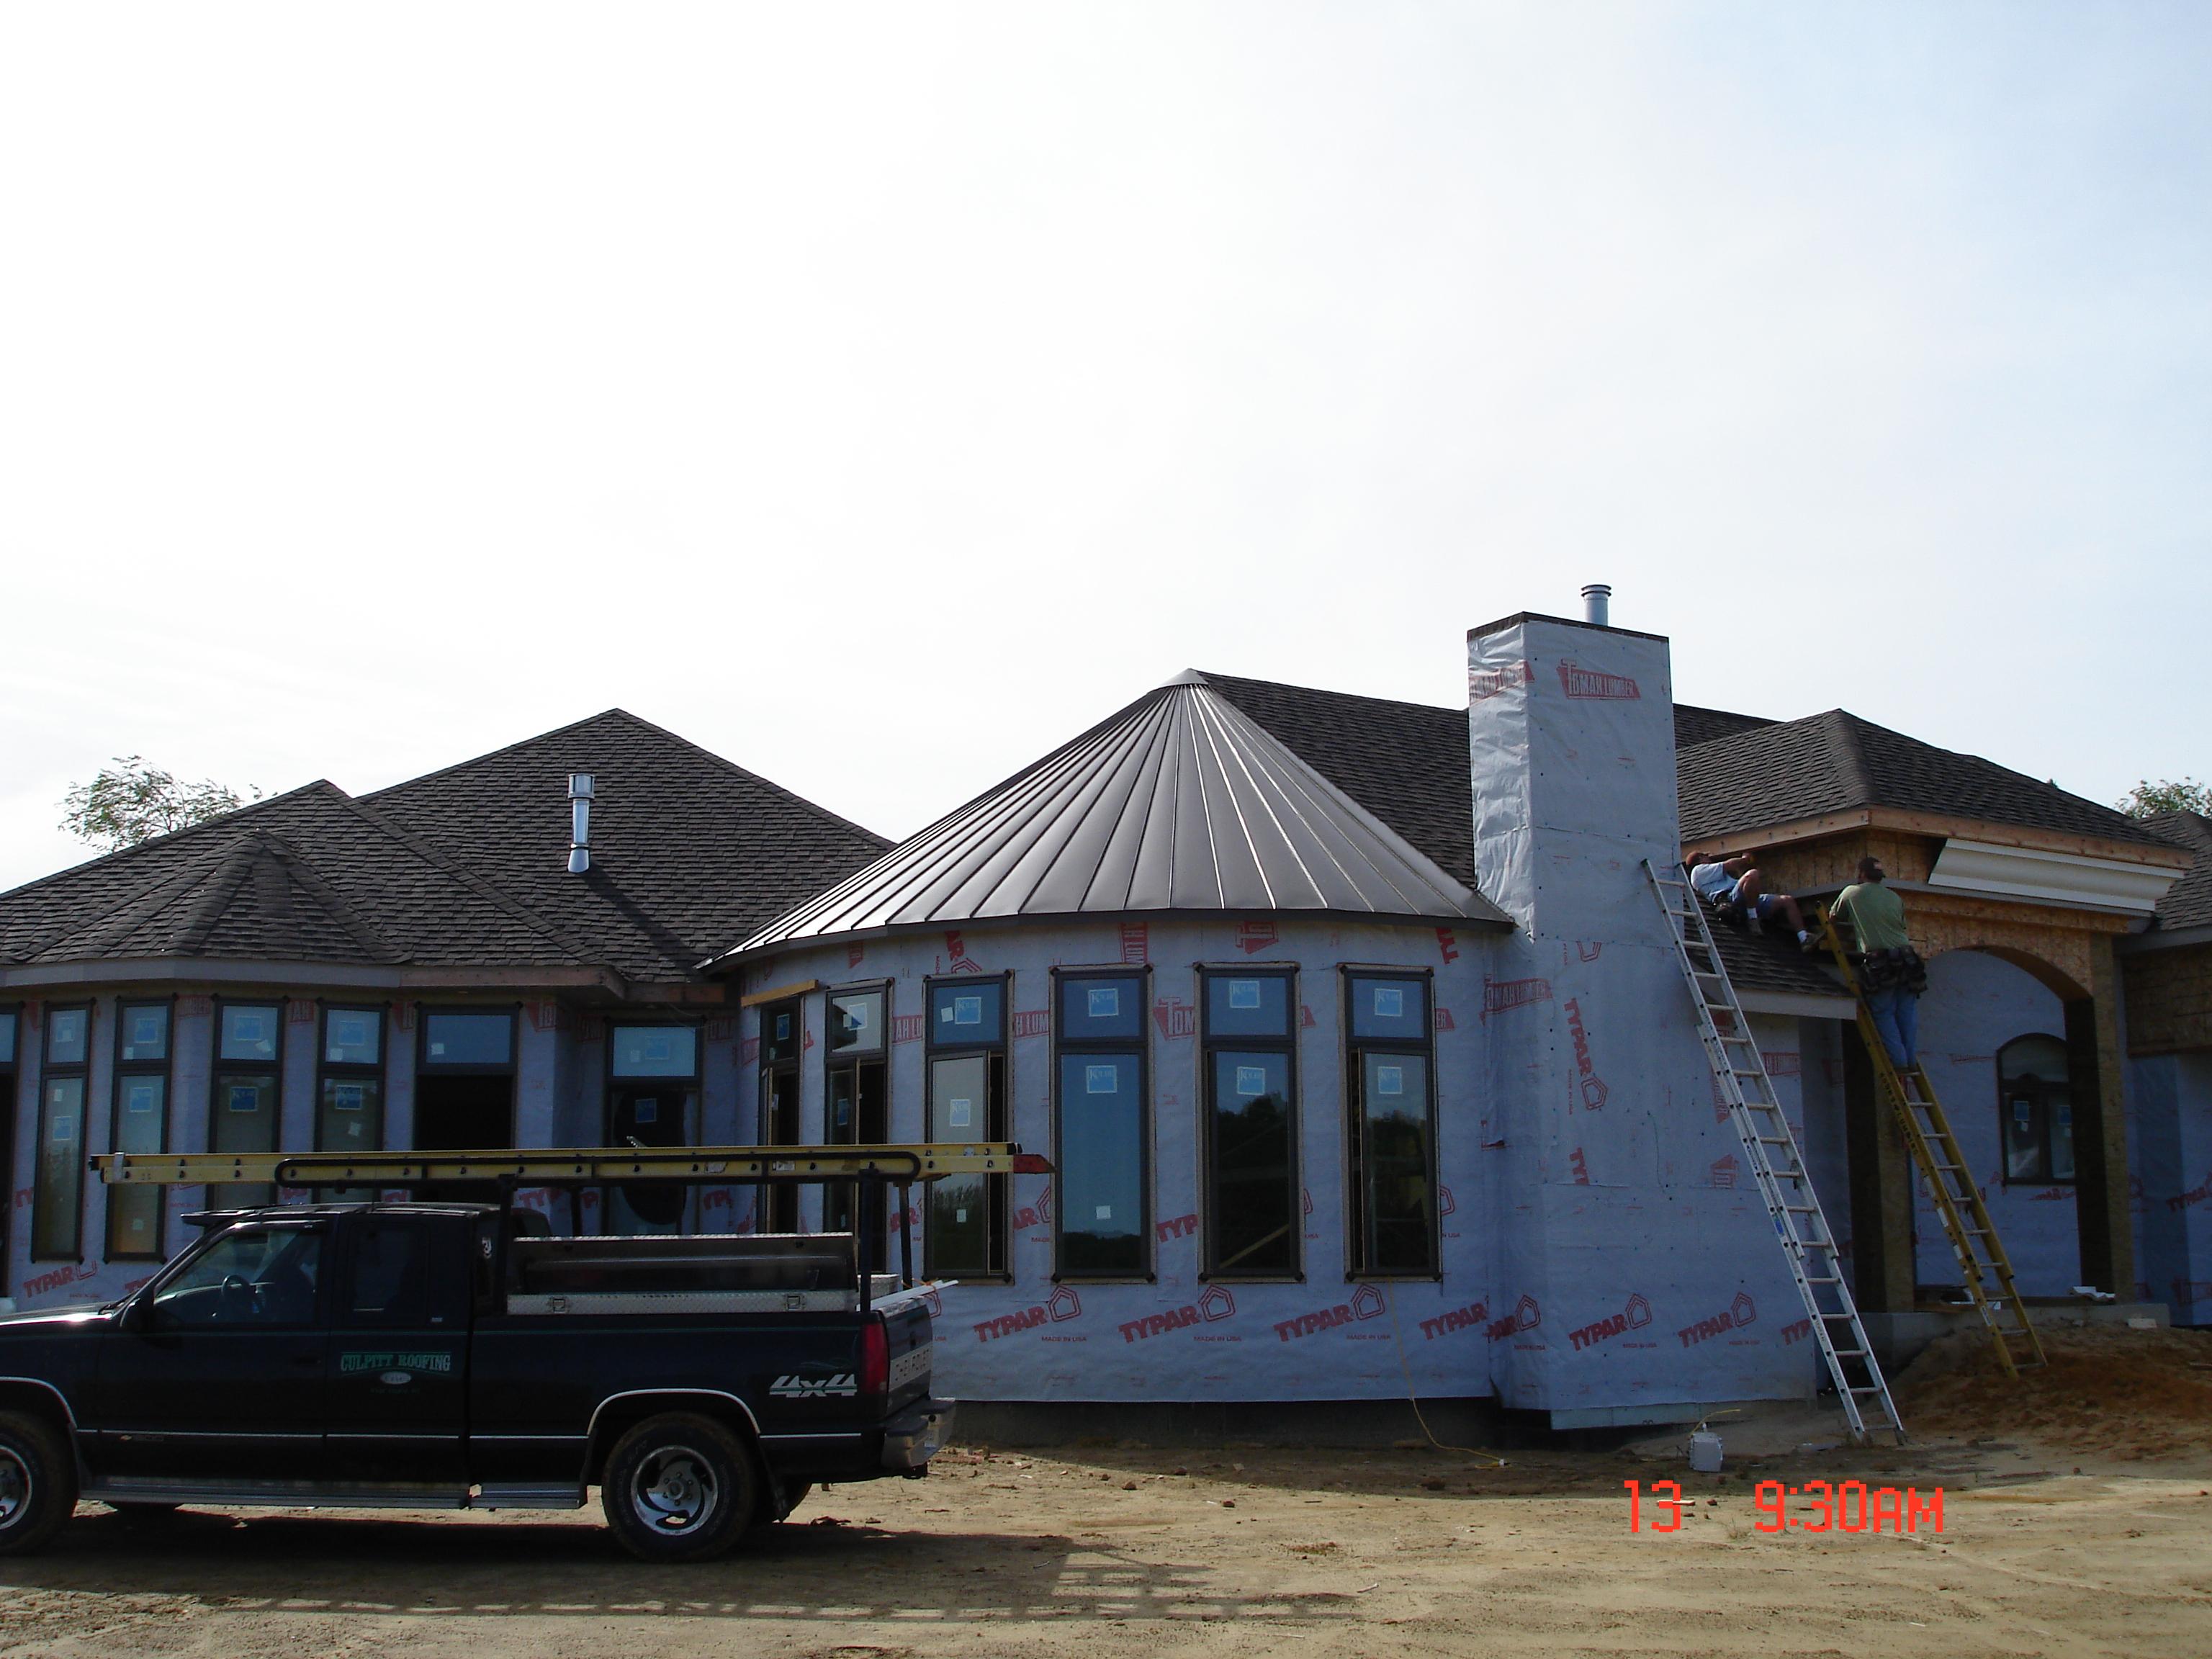 Standing seam double lock sheet metal roofing brown medium bronze dark house residential wisconsin minnesota iowa illinois north dakota